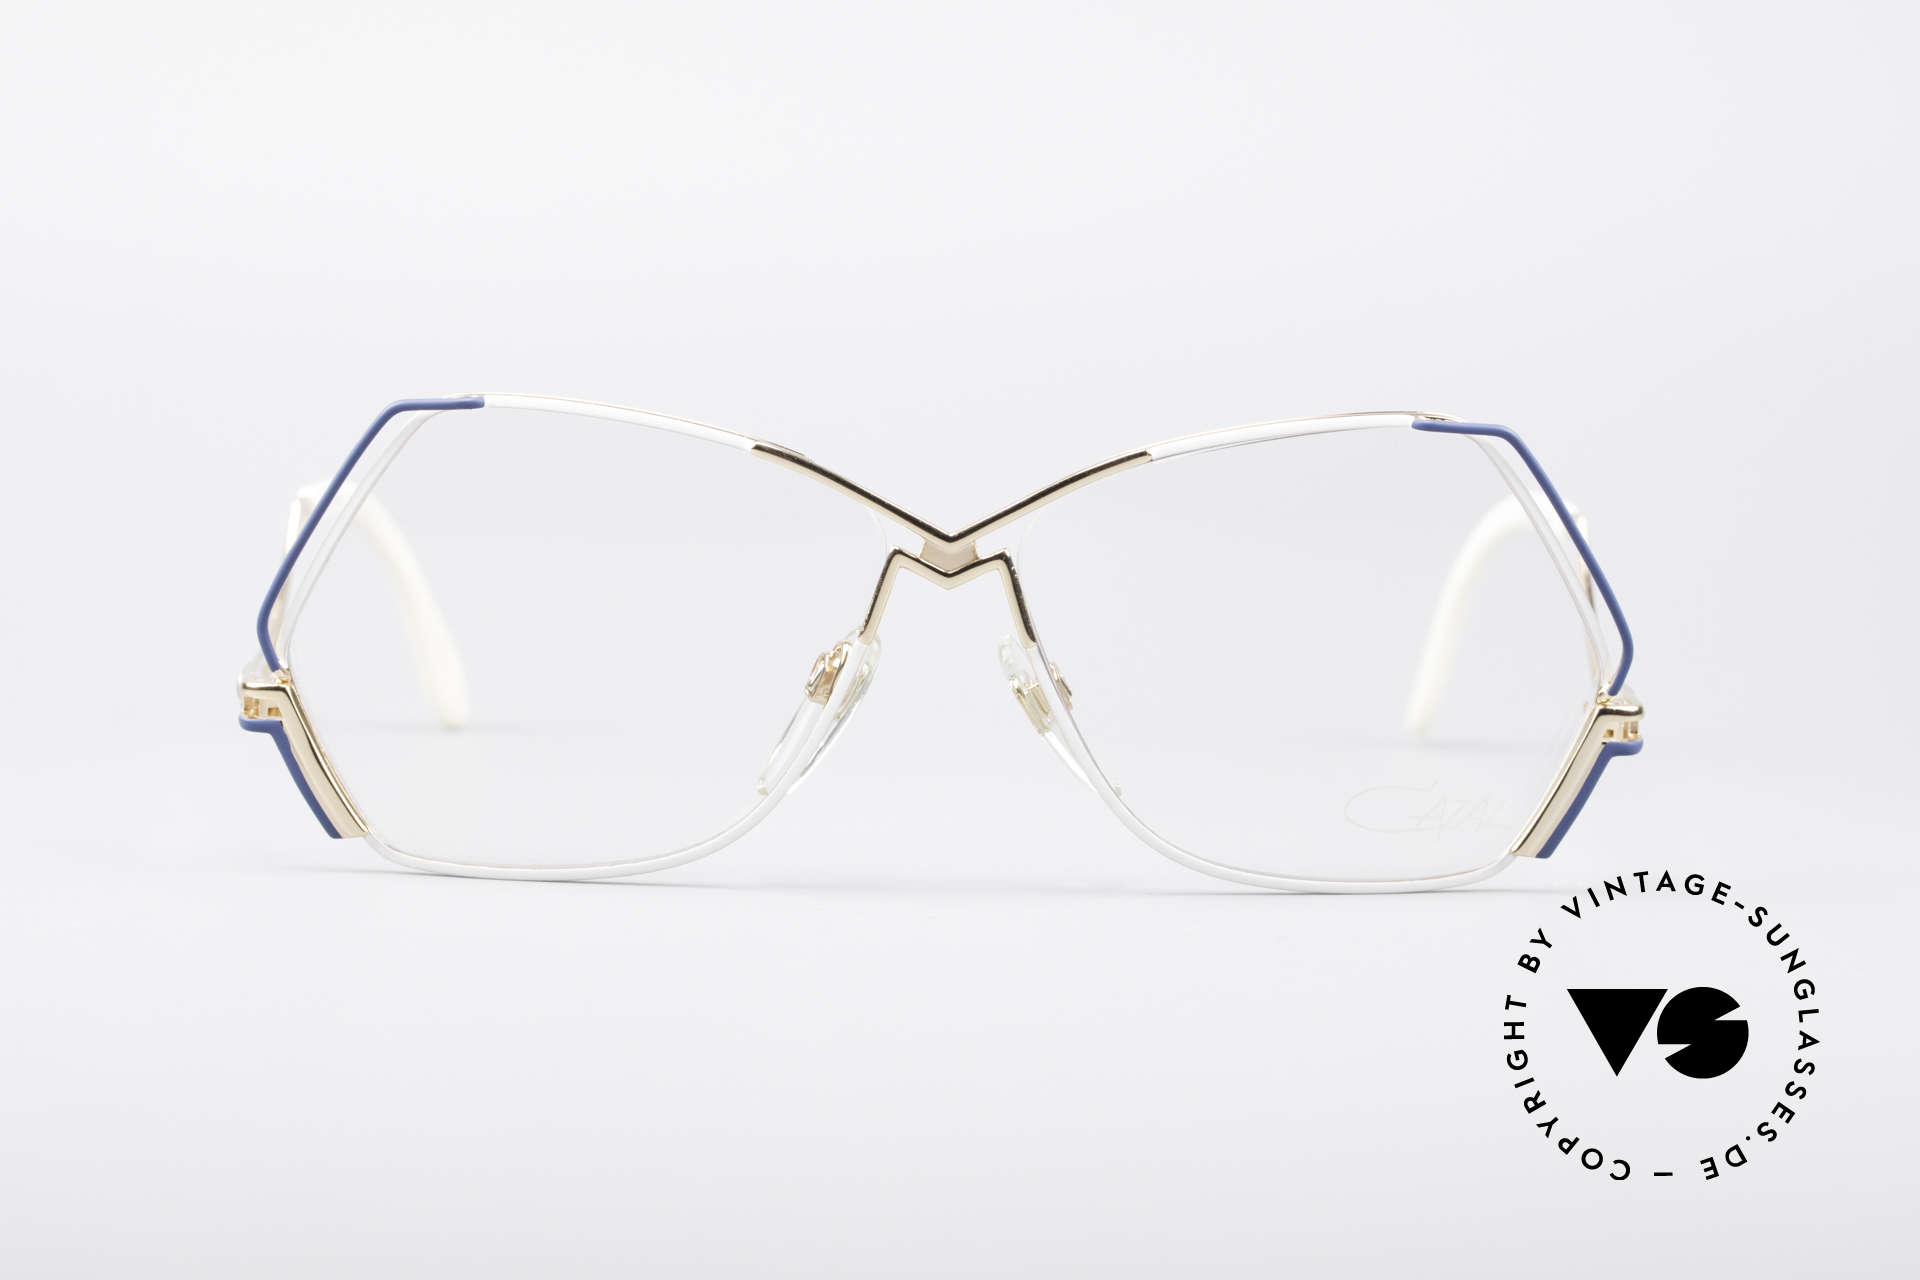 Cazal 226 West Germany Vintage Glasses, enchanting creation by Mr. CAri ZALloni (Mr. CAZAL), Made for Women